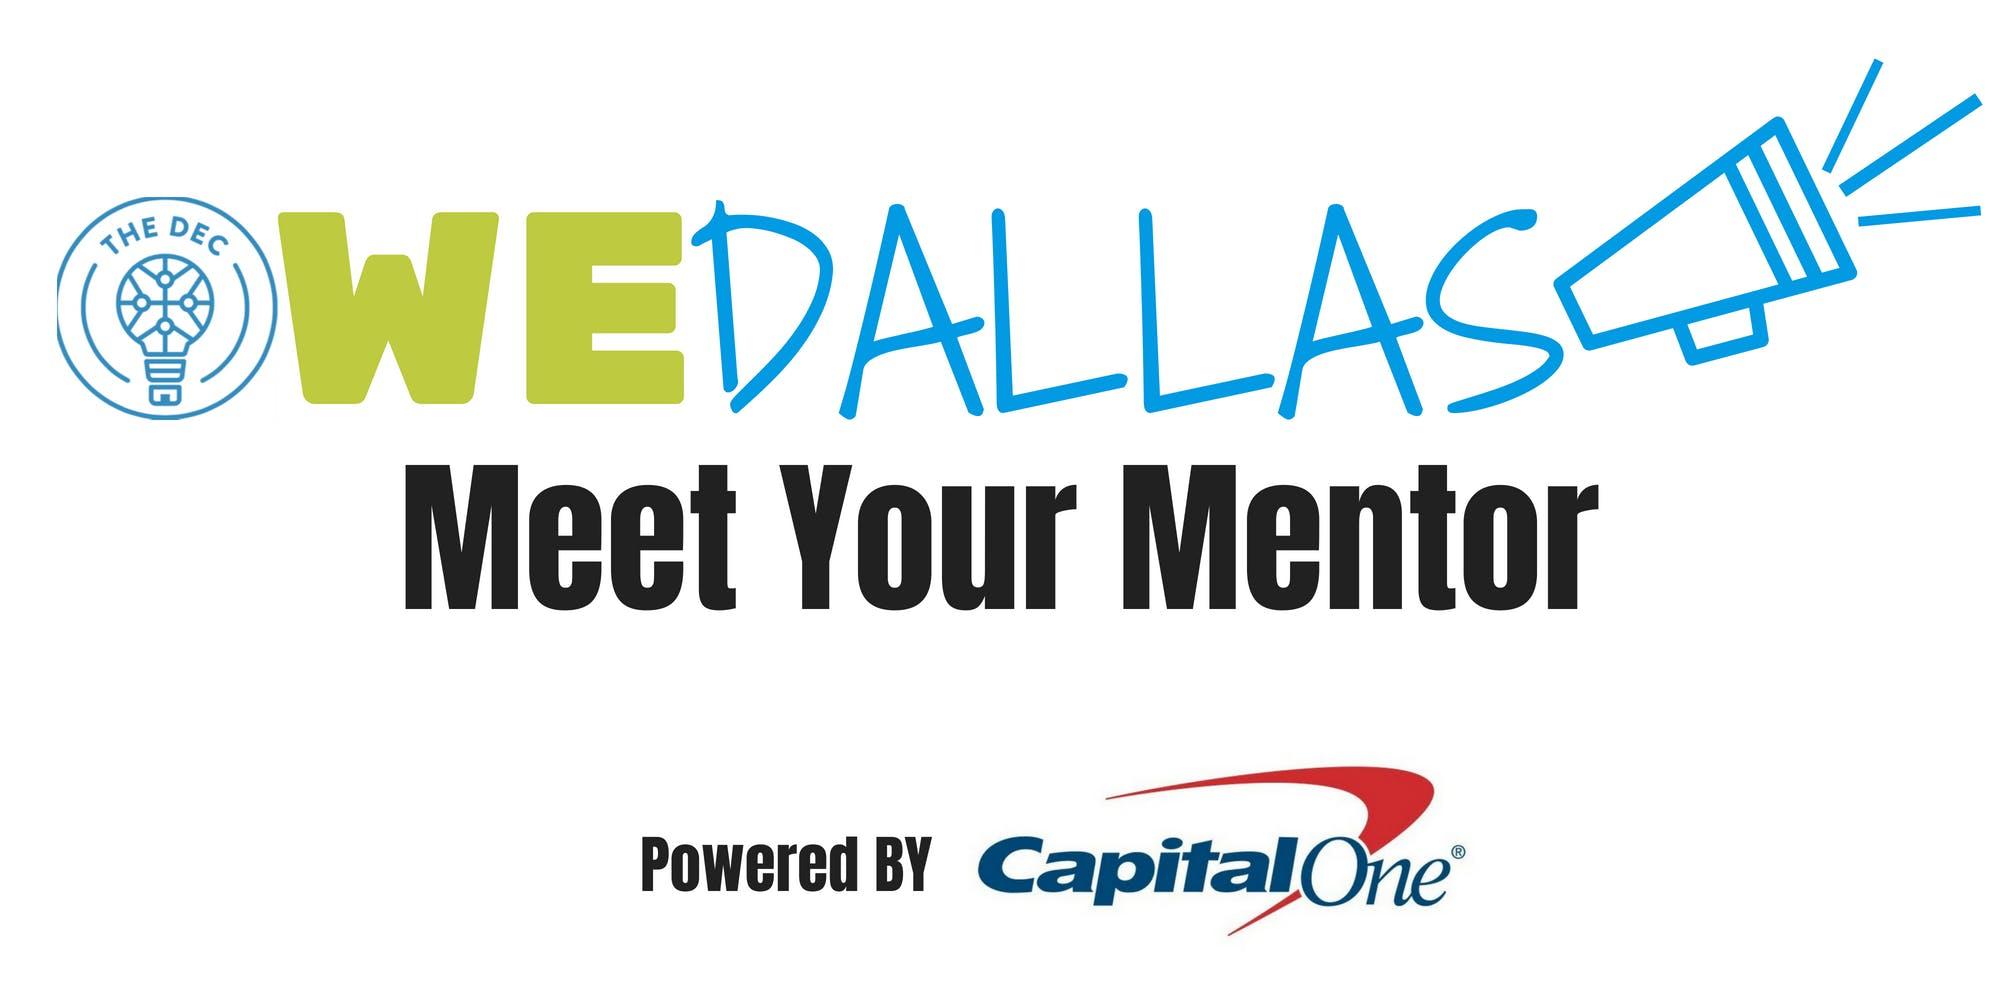 WEDallas : Meet Your Mentor